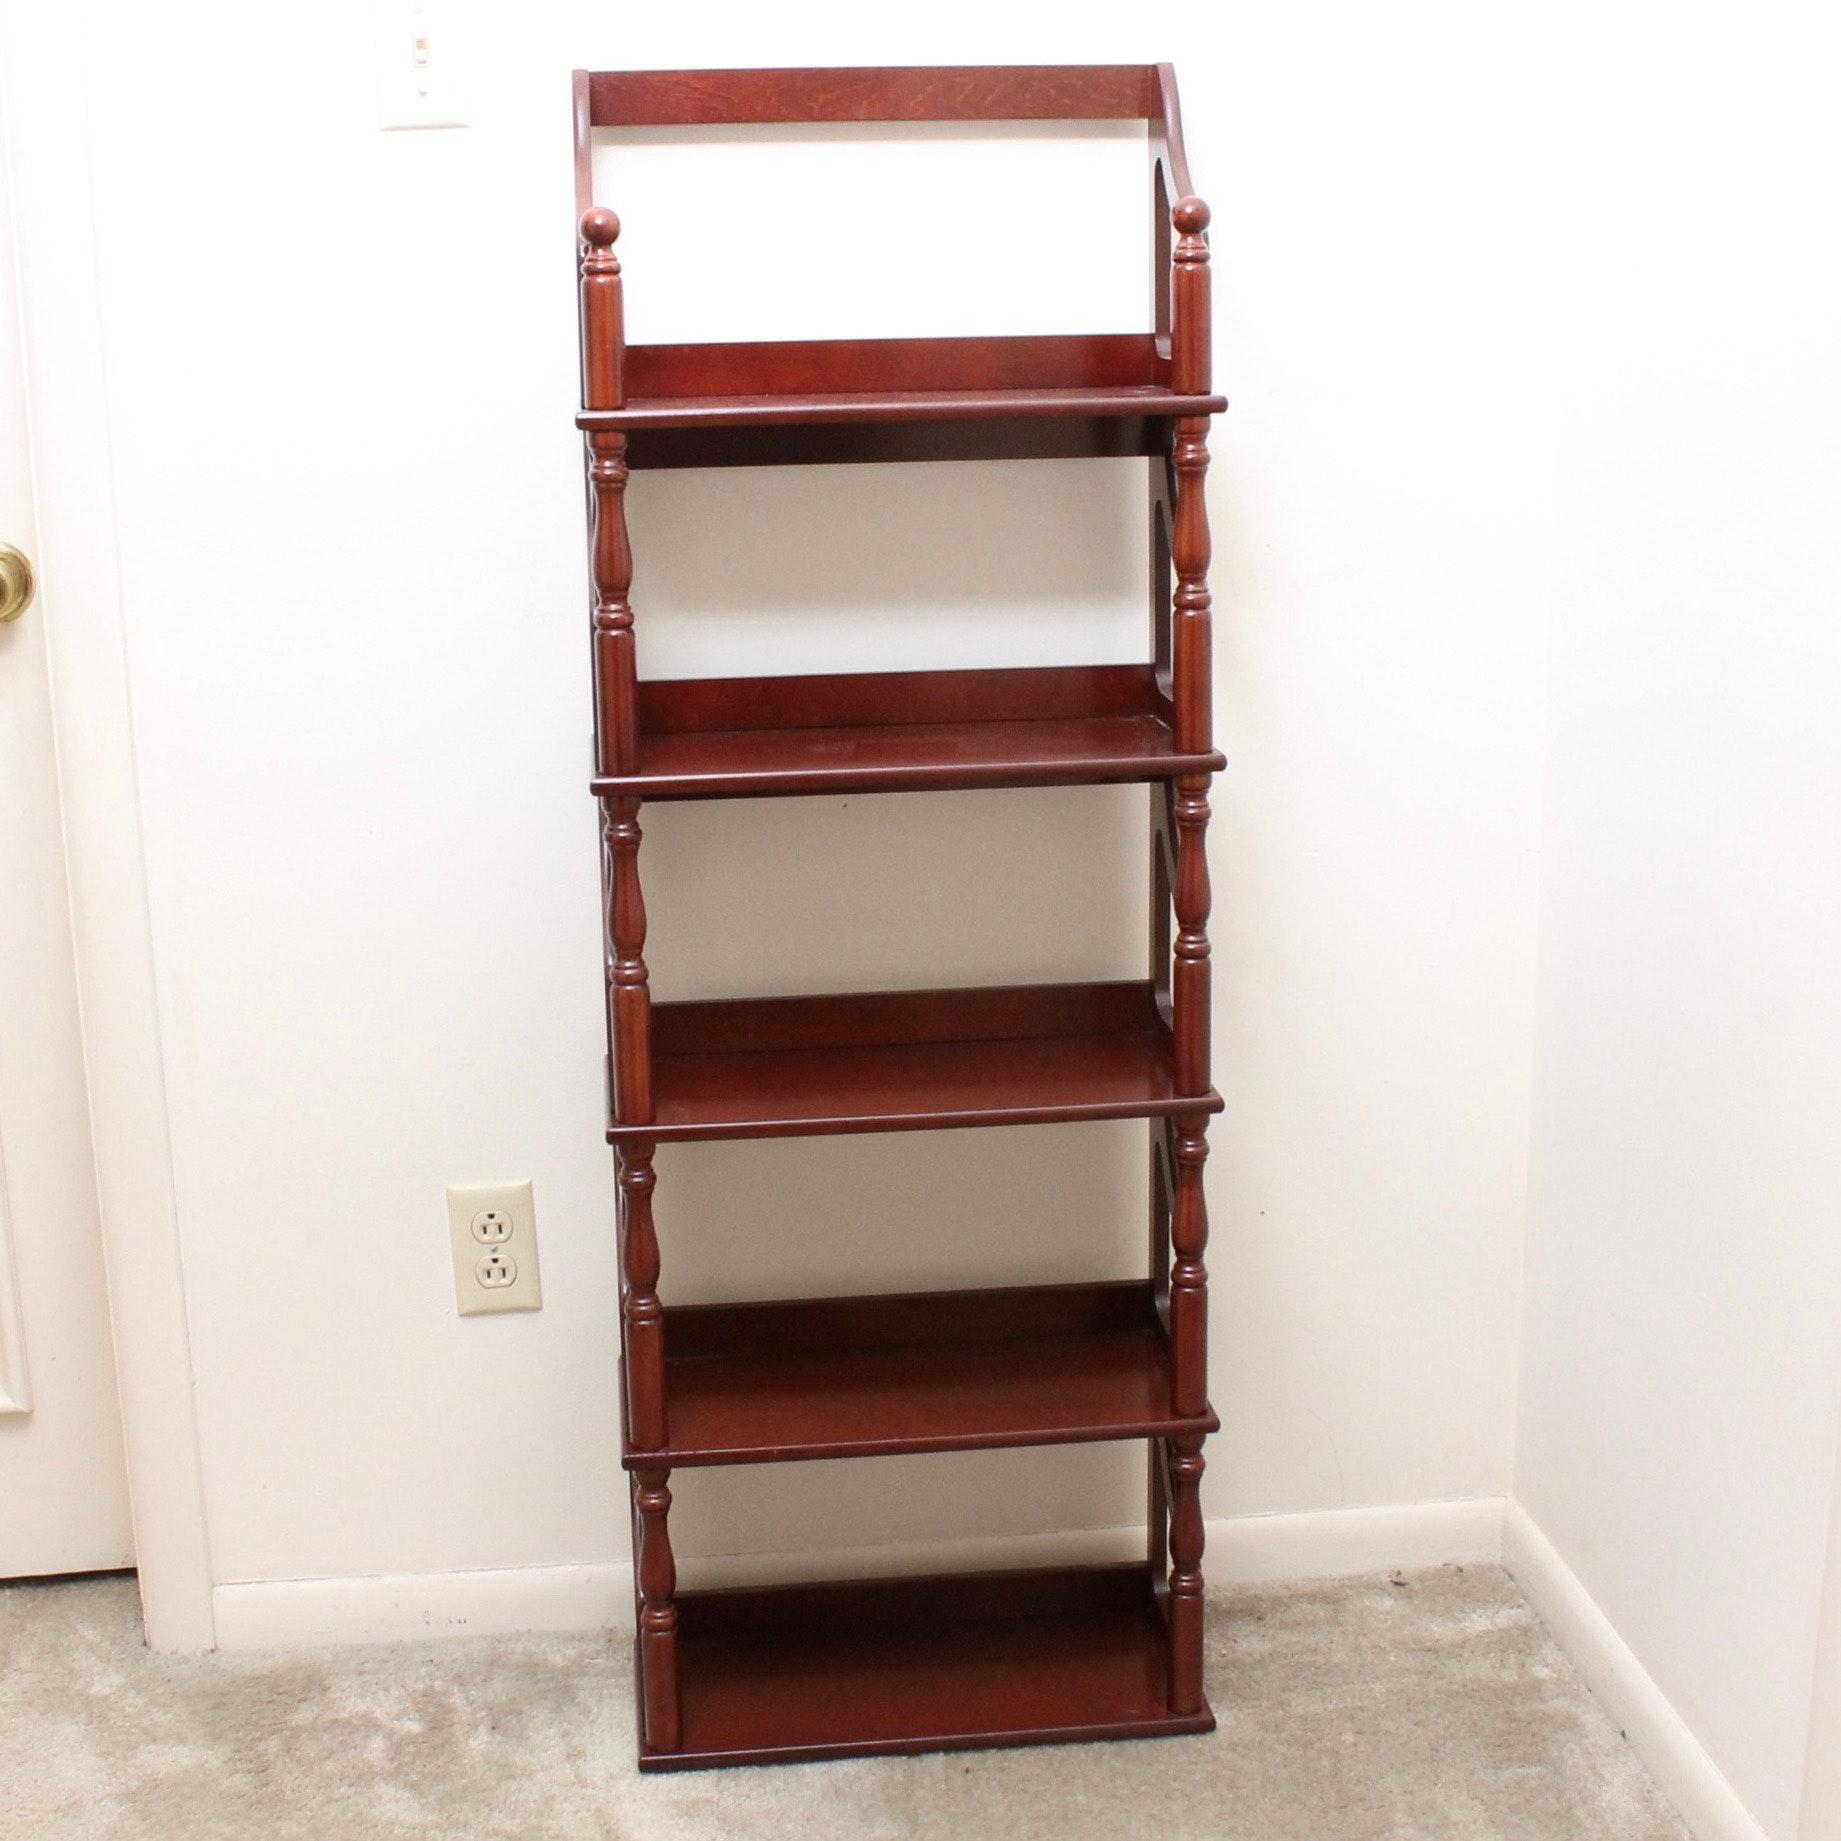 Mahogany Finished Wooden Display Shelf